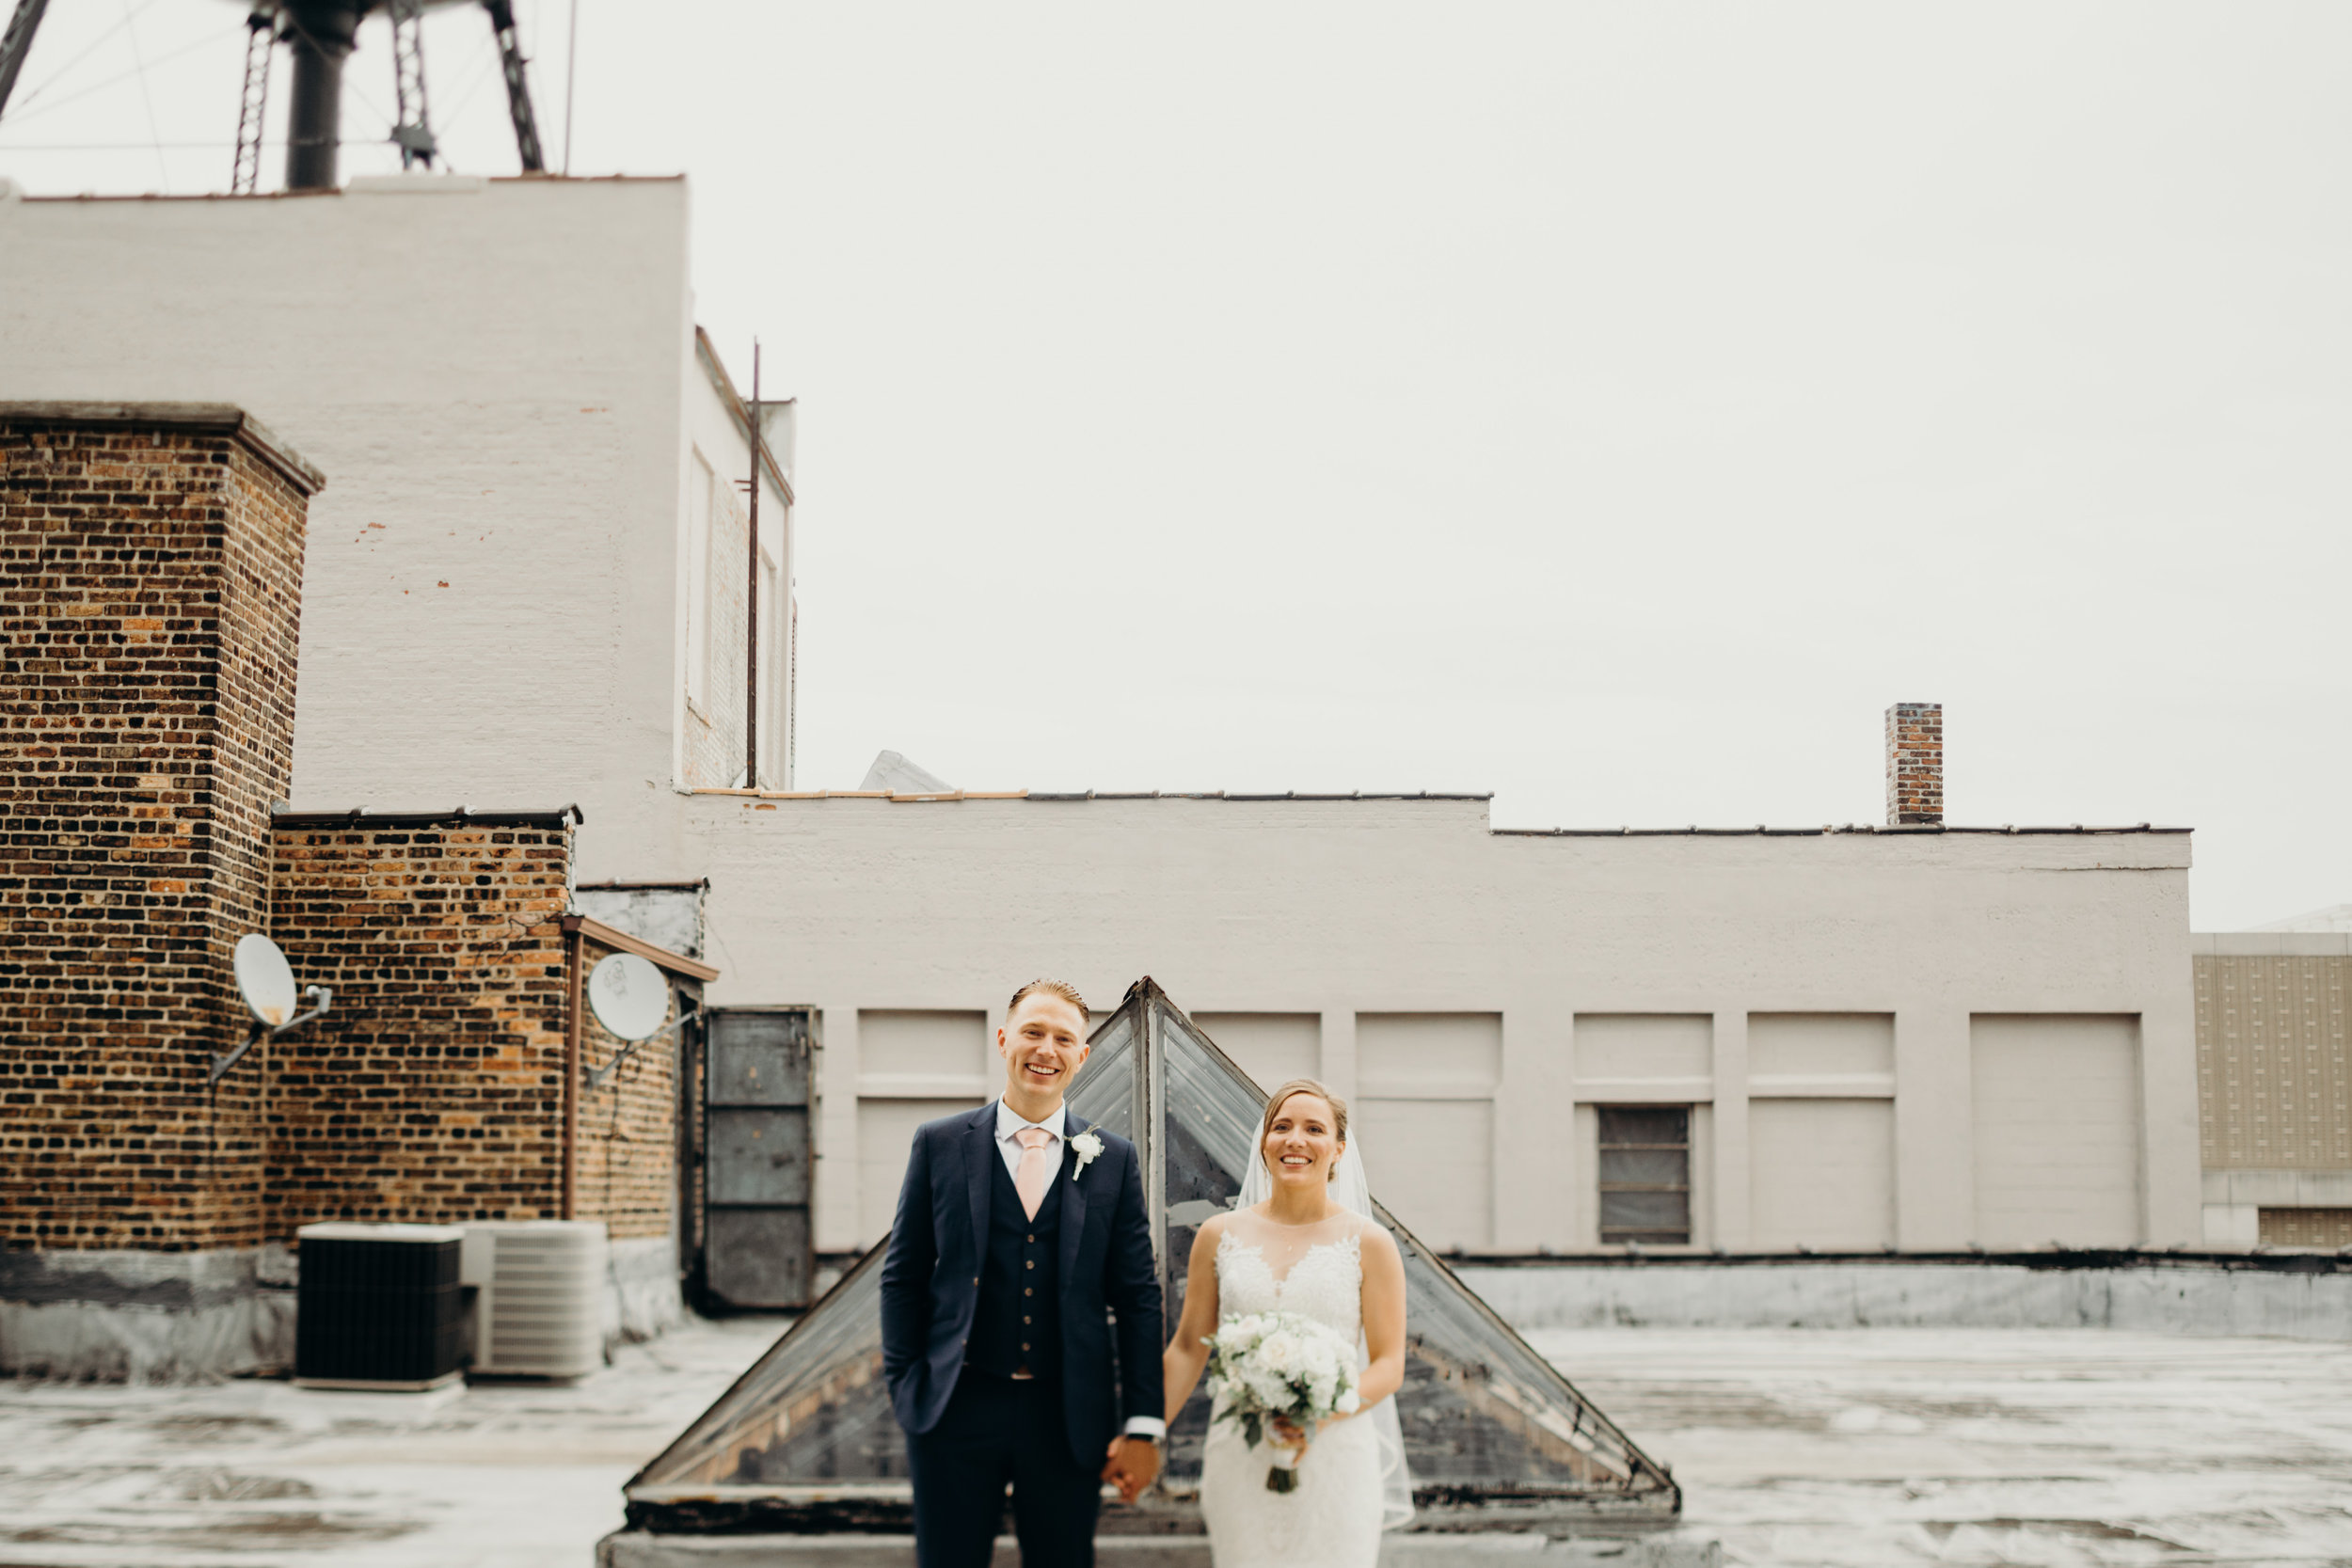 Vintage Wedding_Polly C Photography_20171726183951.jpg